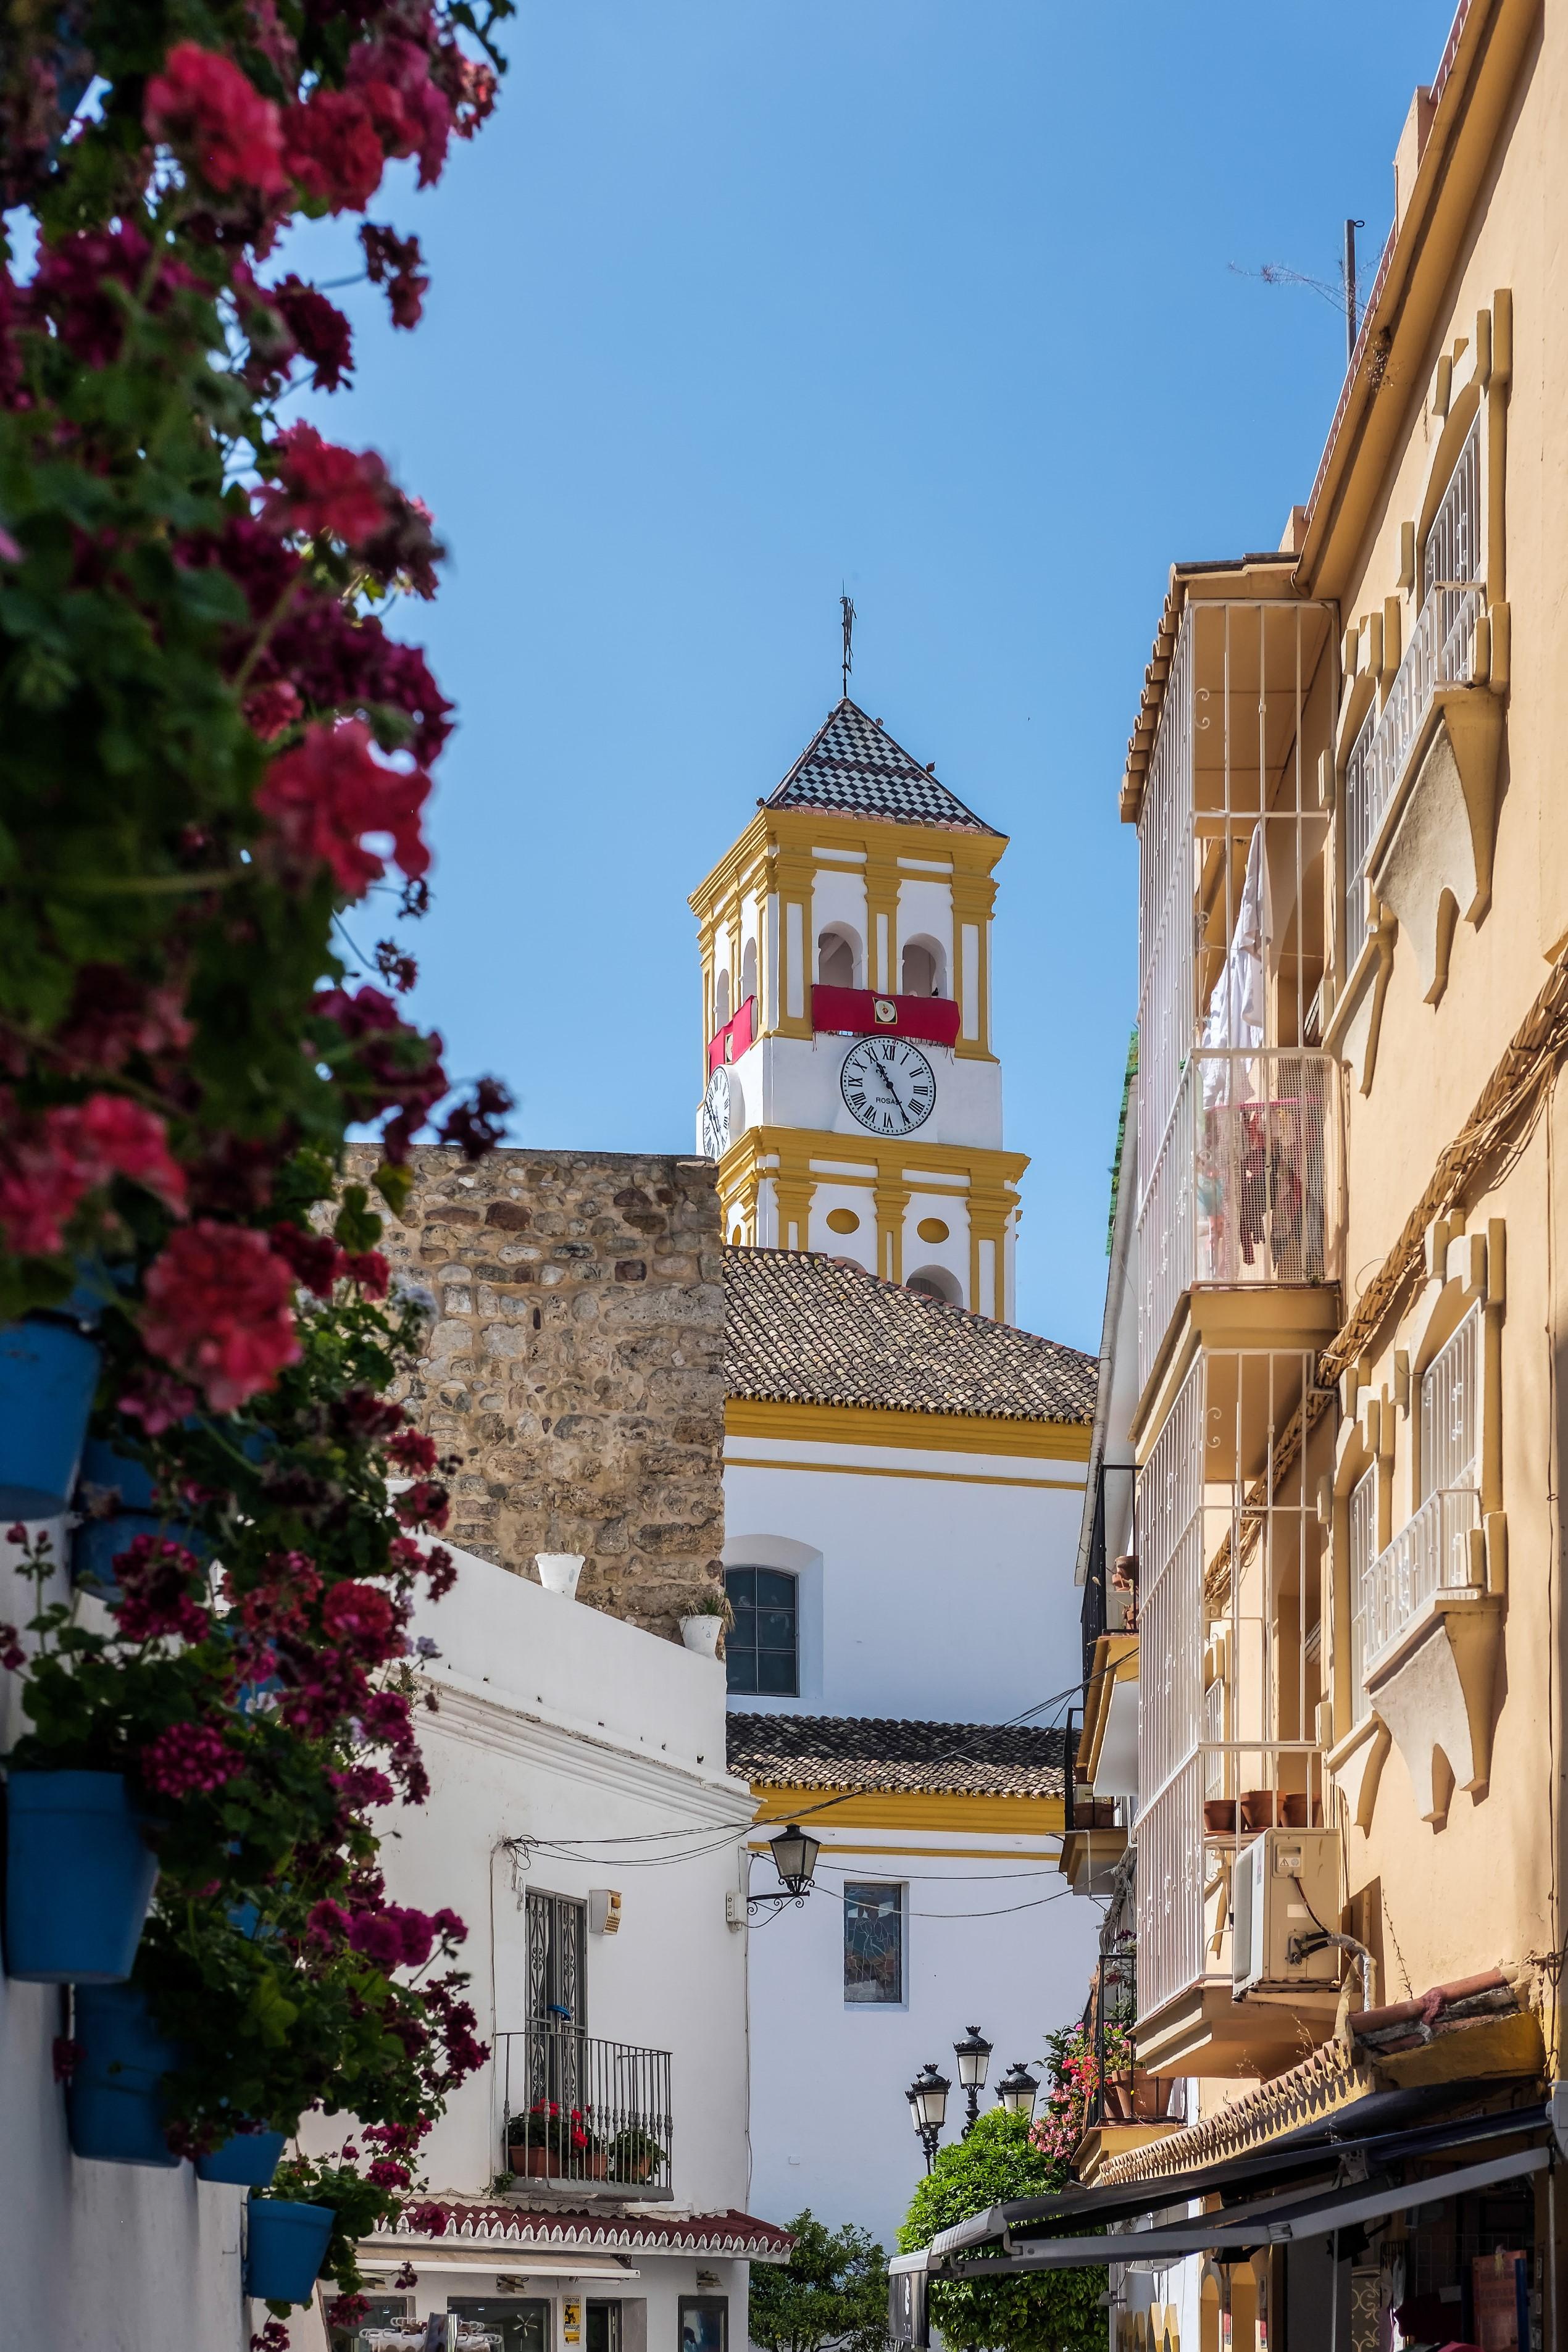 Marbella - A way of life